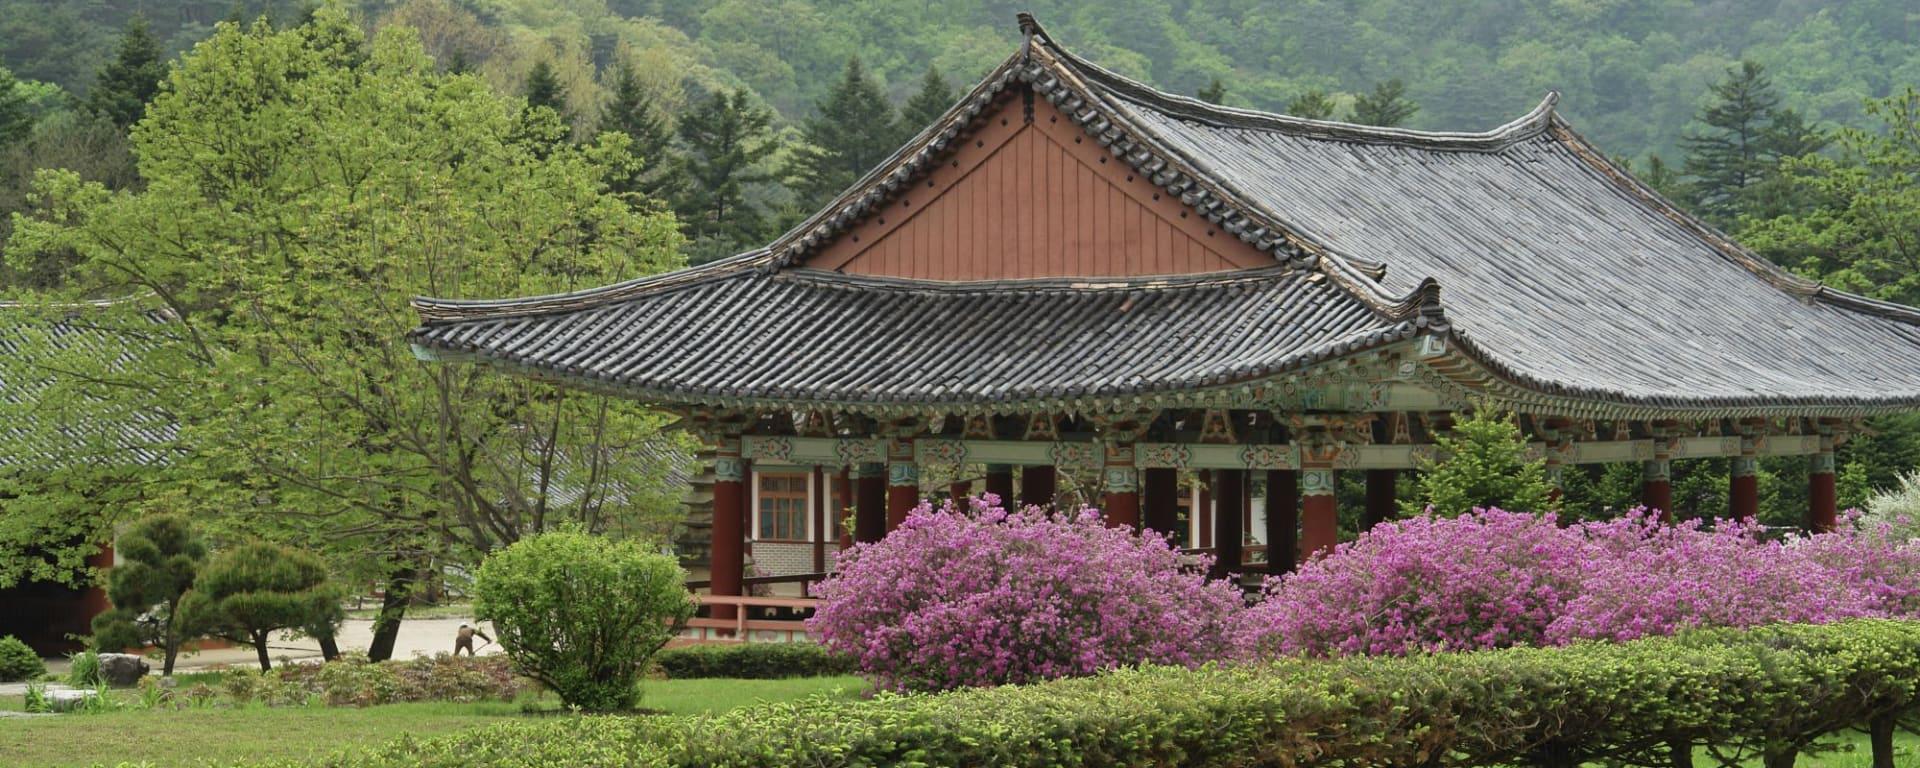 Wissenswertes zu Nordkorea Reisen: Mt Myohyang Pohyon temple